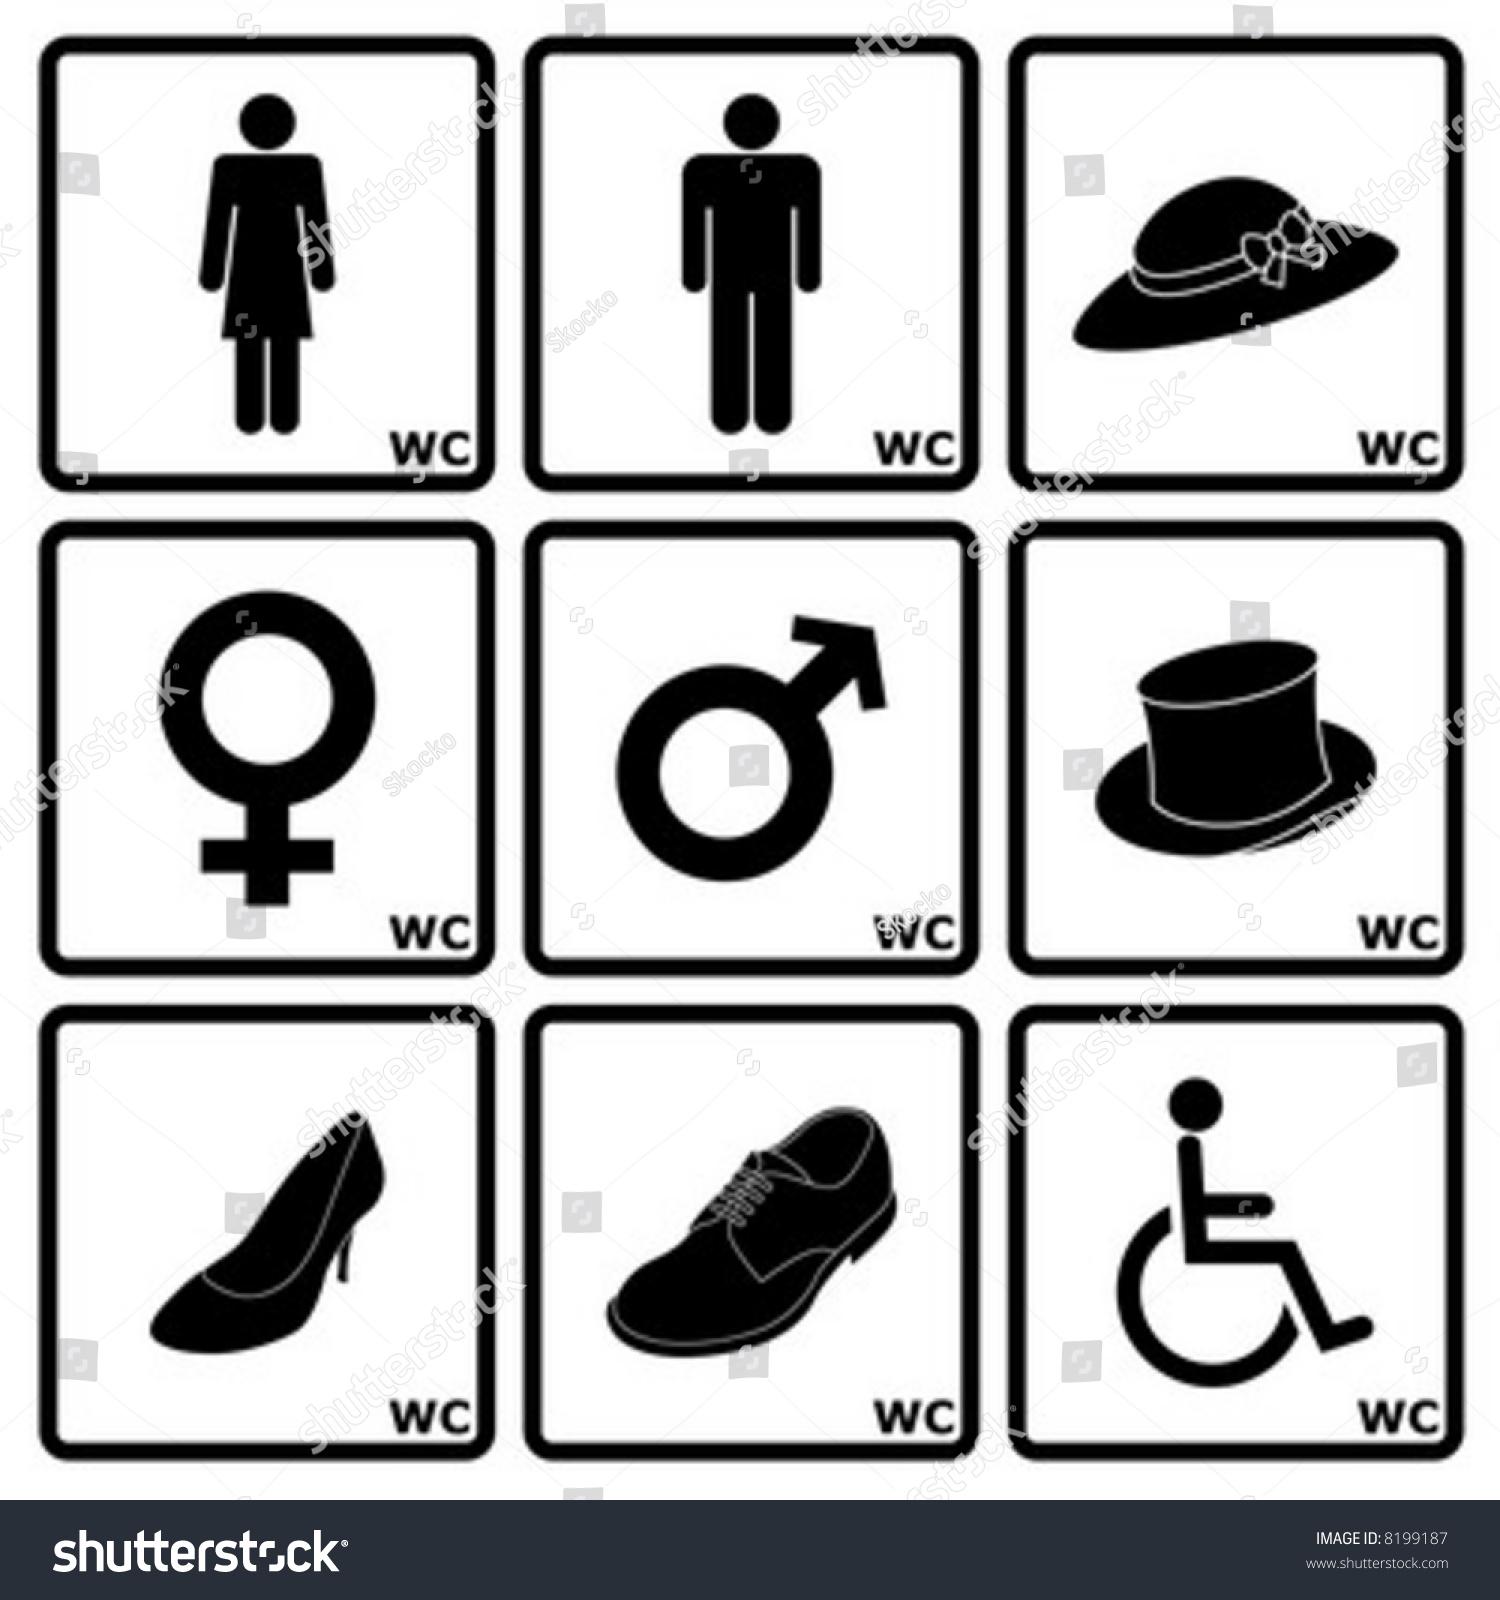 Signs Indicating WomenS And MenS Toilets Stock Vector Illustration  -> Banheiro Feminino Vetor Free